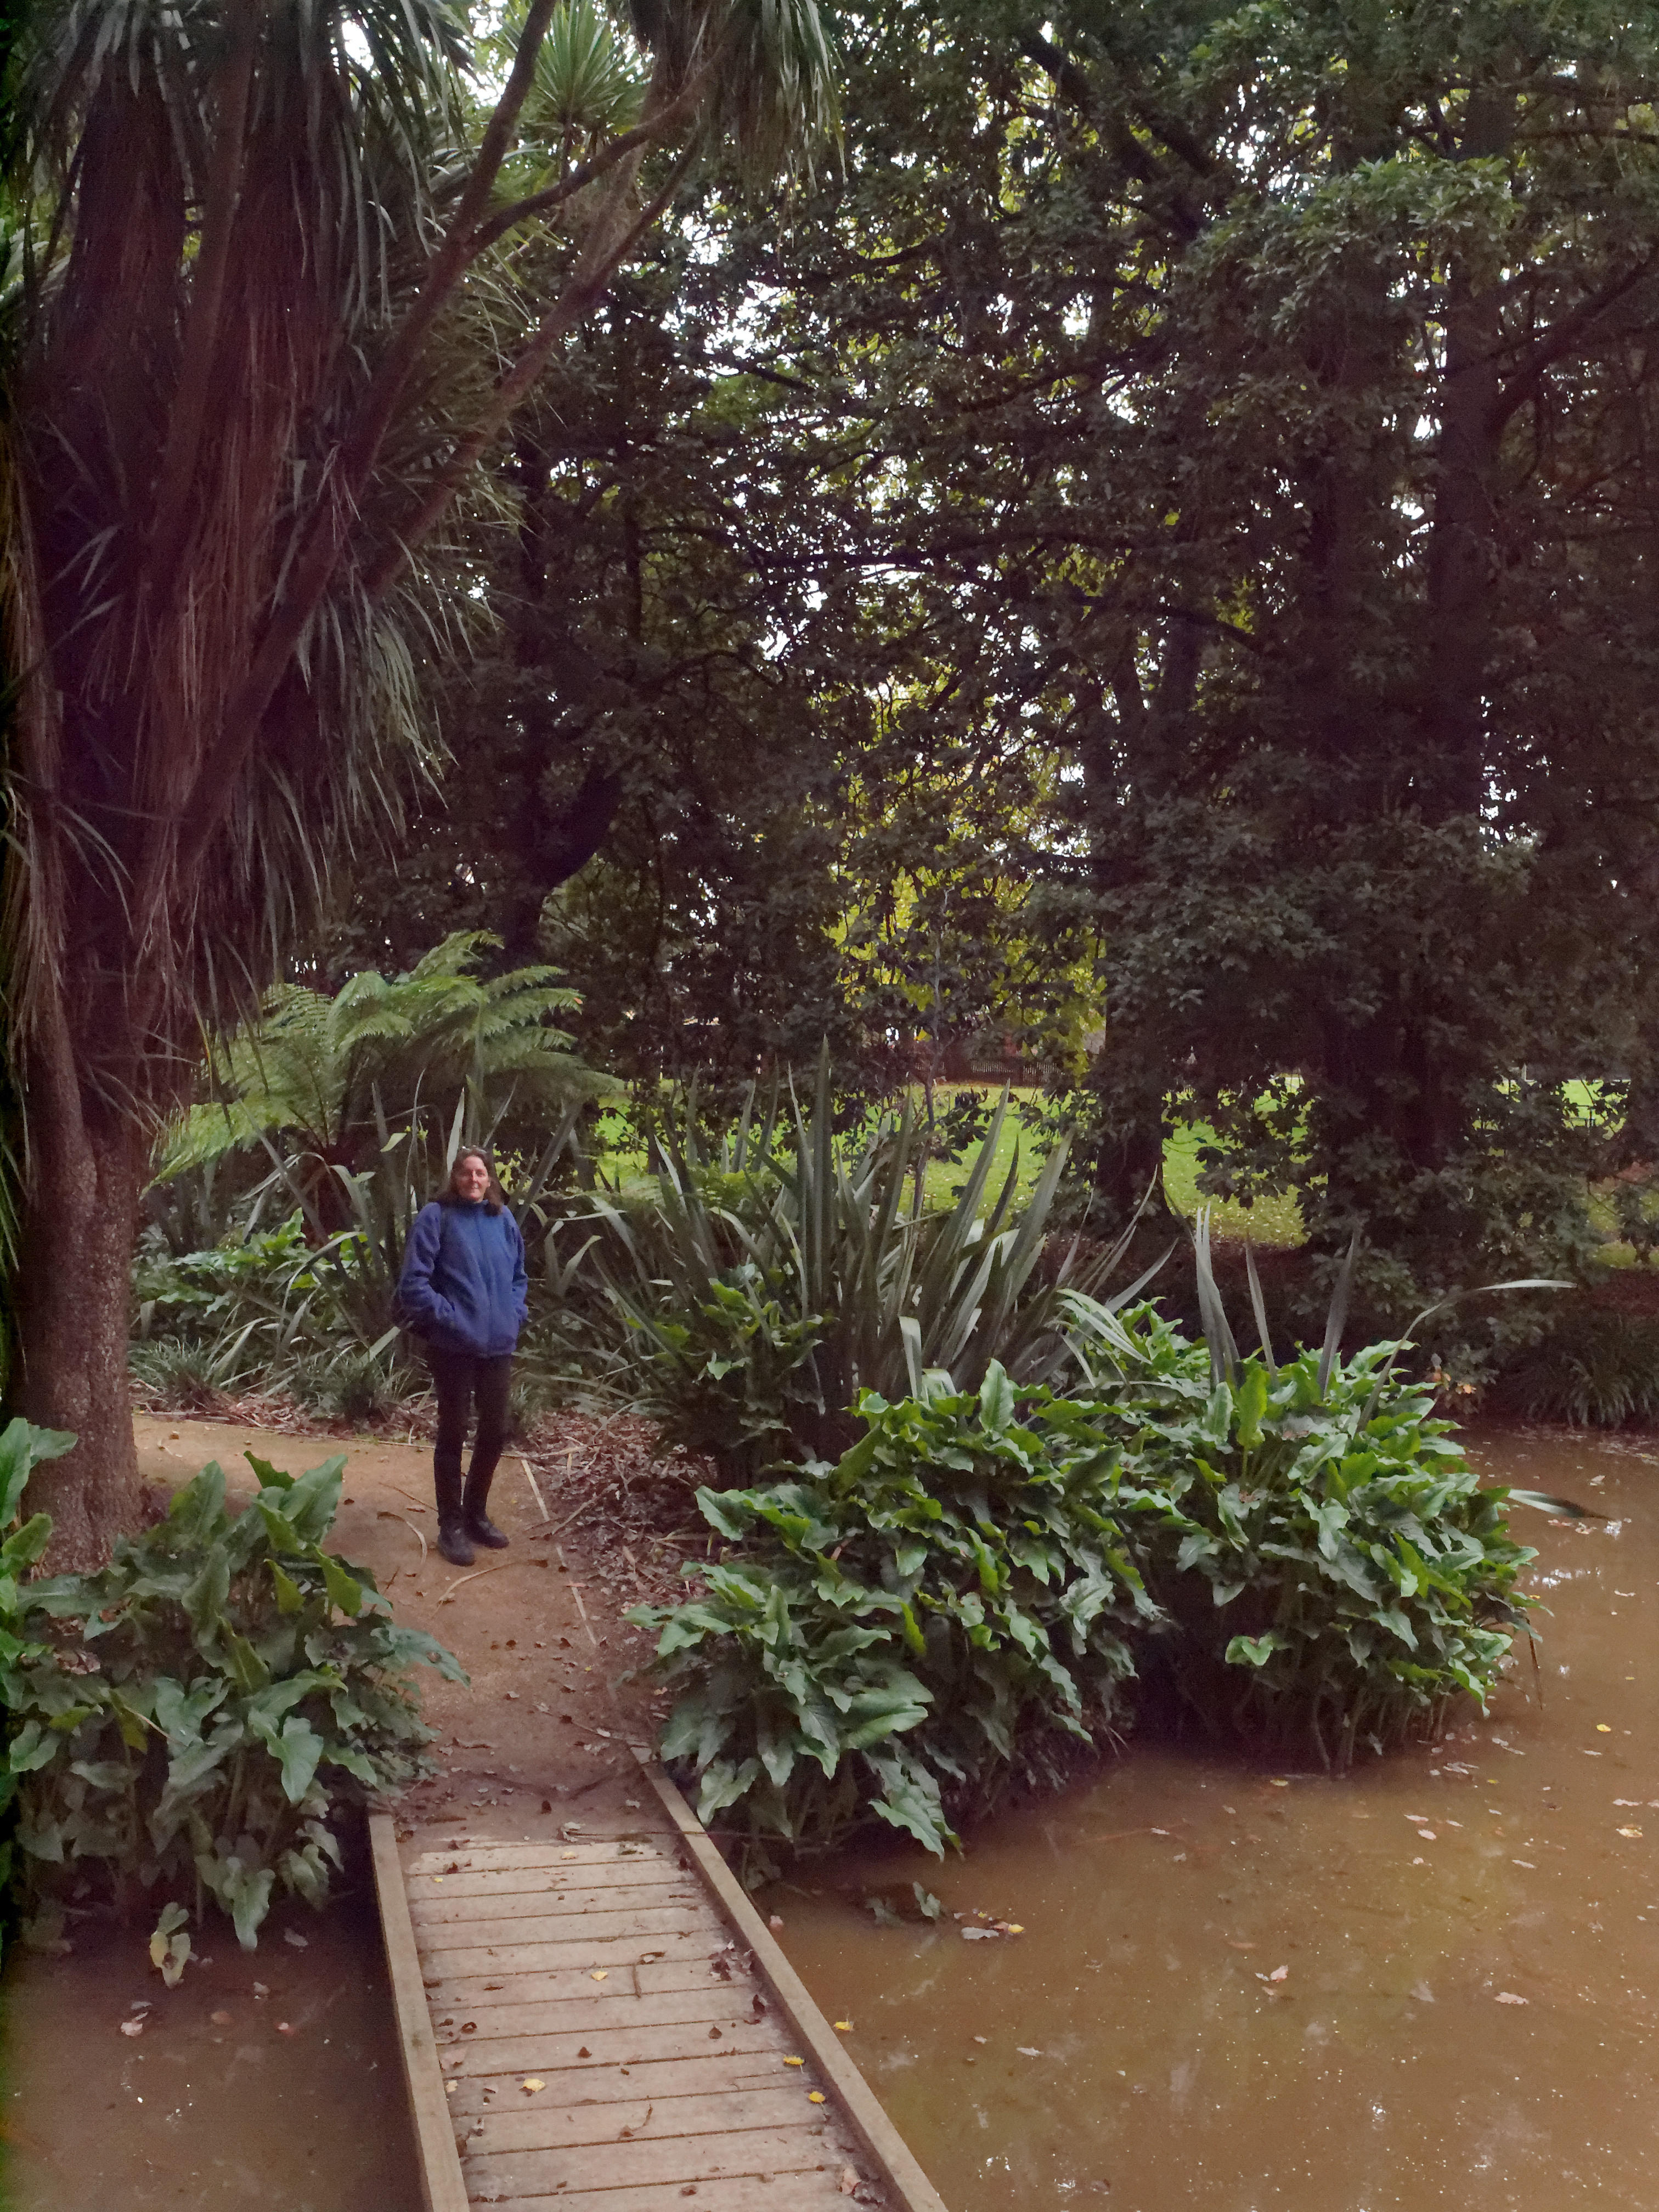 This should be Buninyong-Botanic-Gardens-1-DxO--orig.jpeg.  Is it missing?